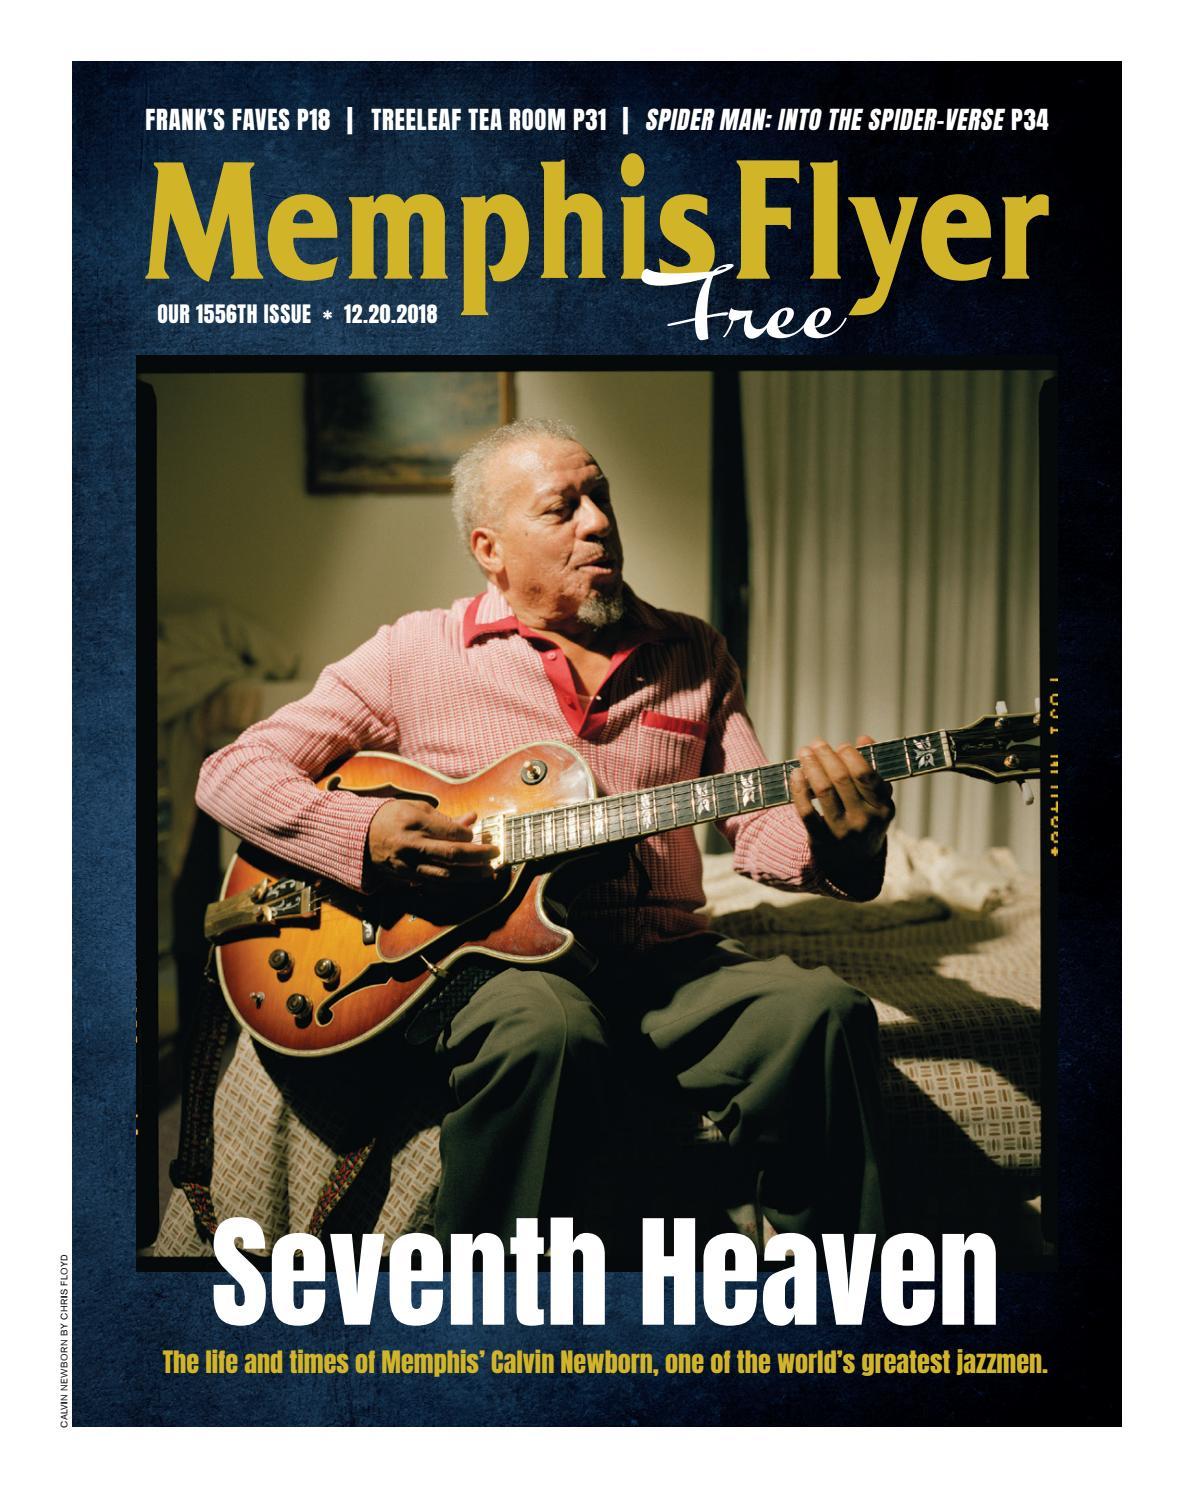 Miles Davis Blue Jazz Greatest Musician Play Guitar Fabric Poster Decor H-356